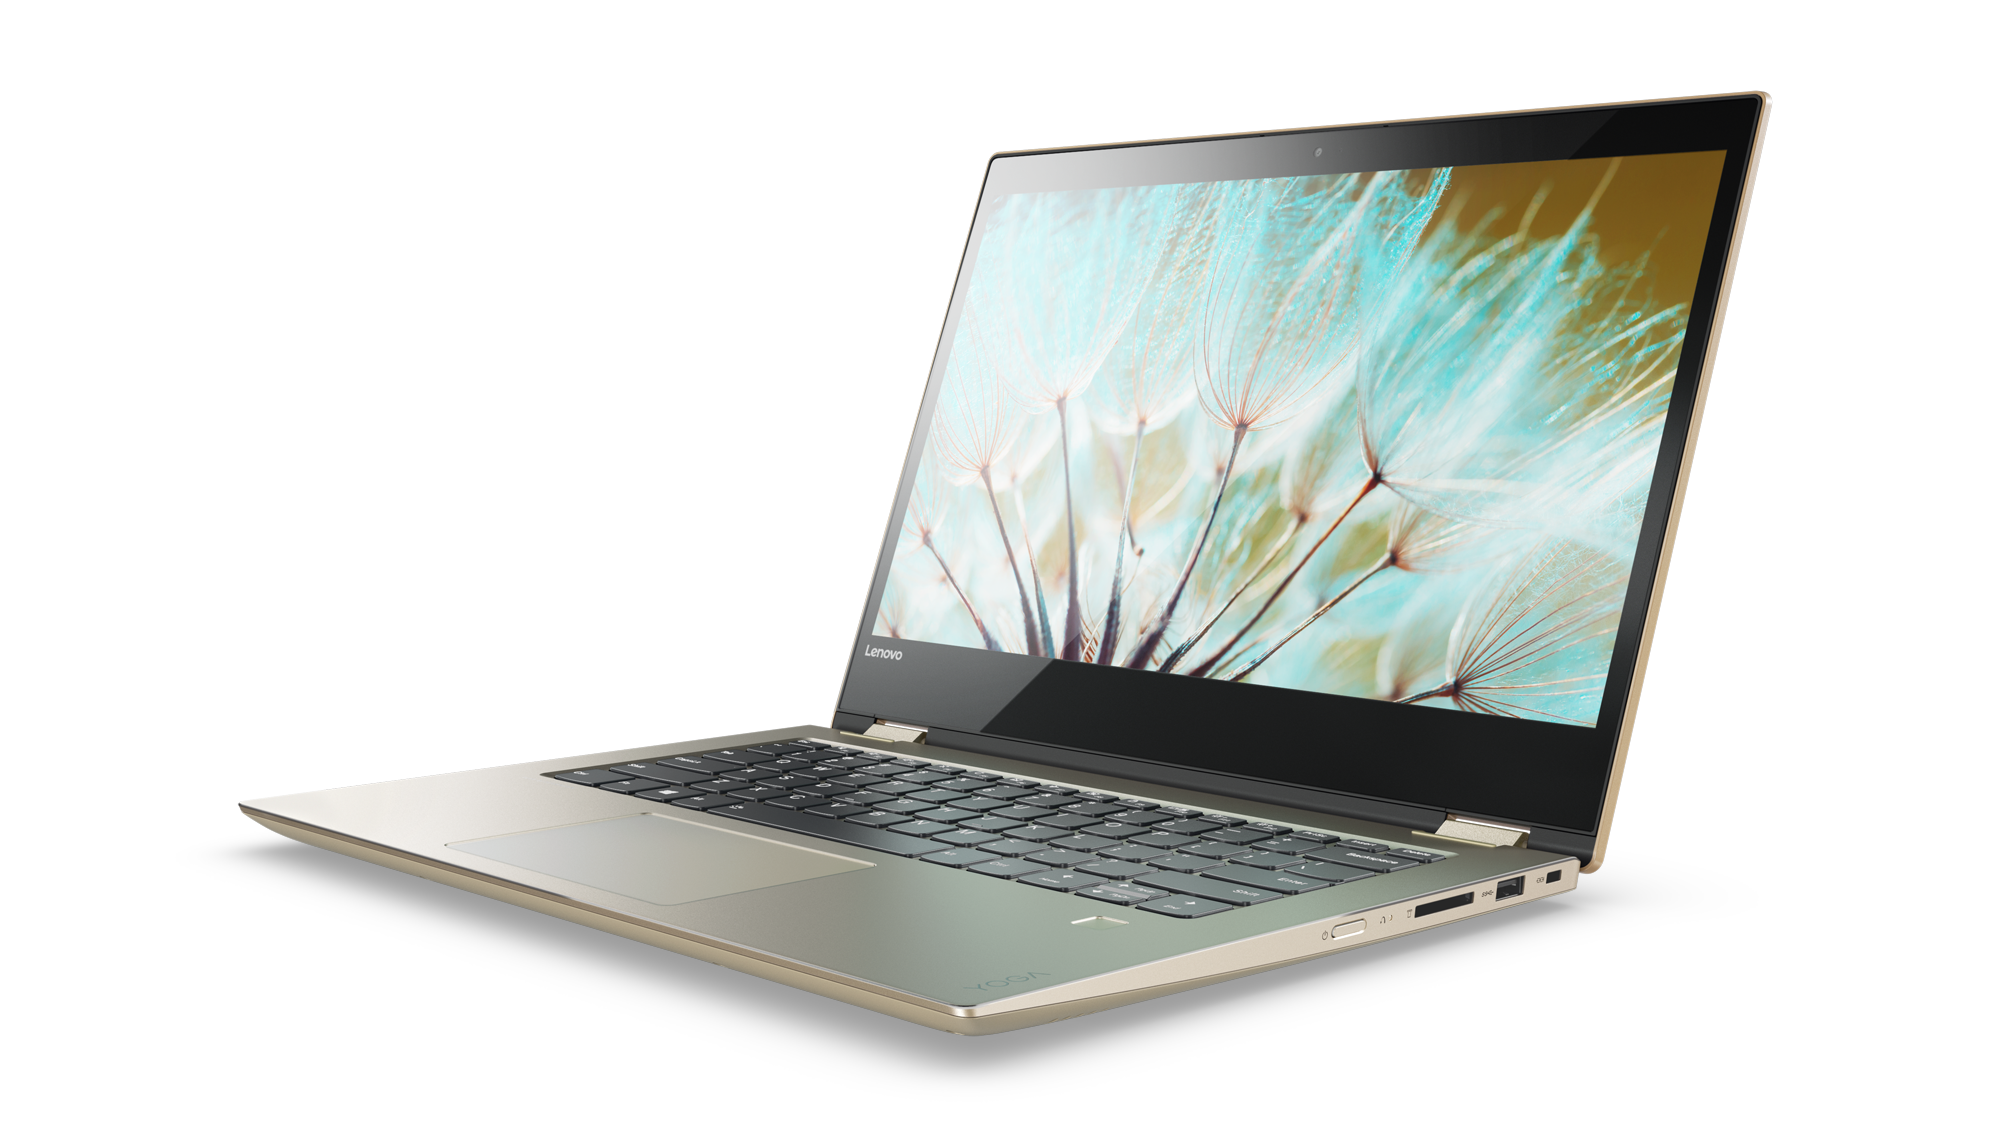 "Lenovo YOGA 520-14IKB i7-7500U 3,50GHz/8GB/SSD 512GB/14"" FHD/IPS/AG/multitouch/FPR/WIN10 zlatá 80X8005DCK"